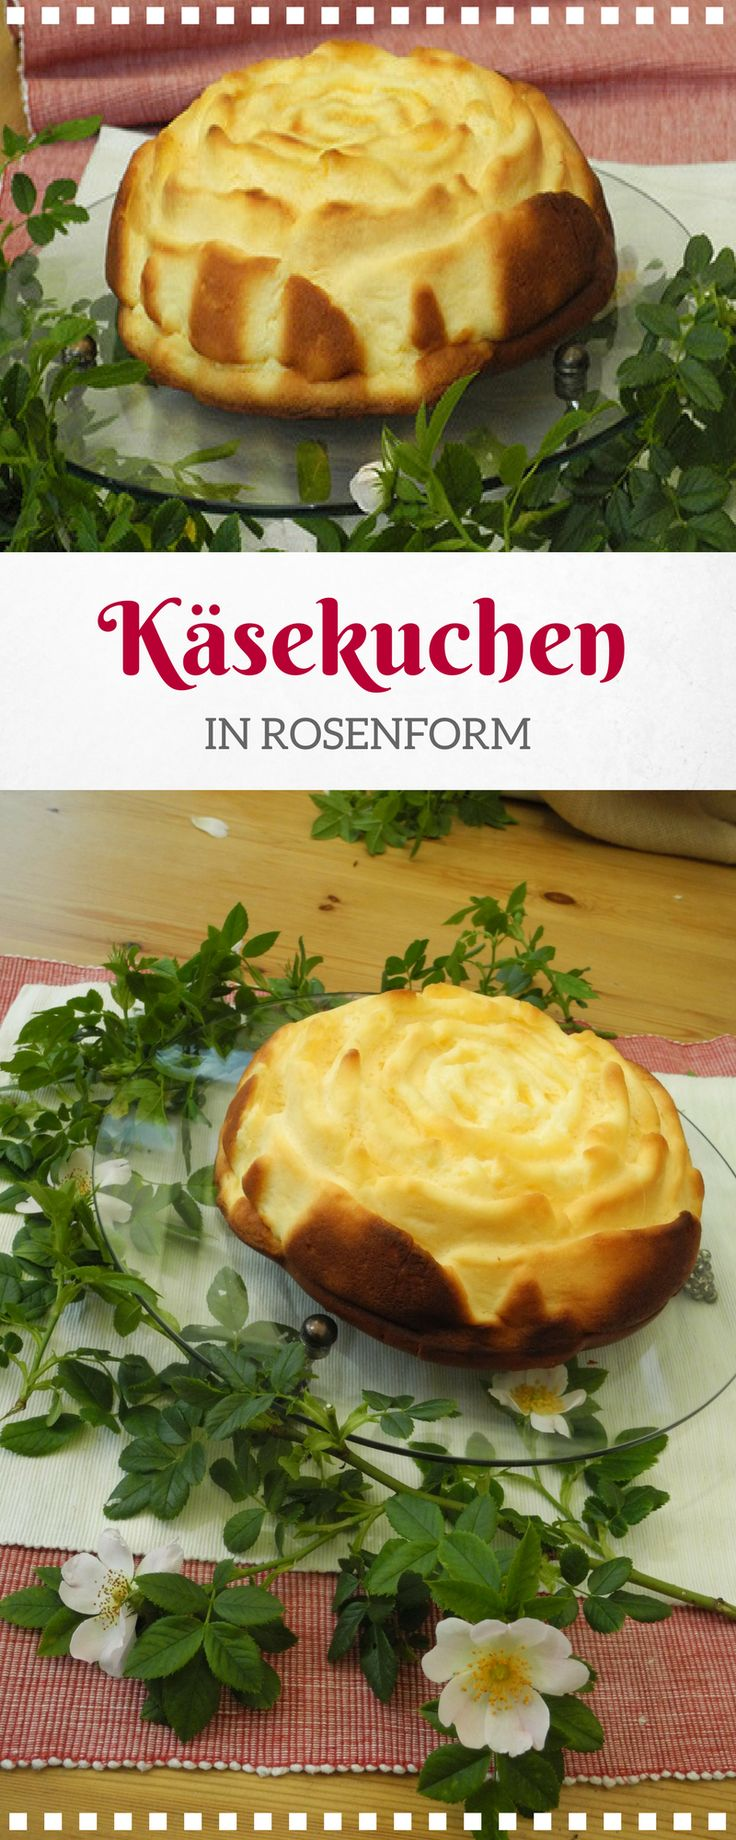 624 best images about backen k sekuchen cheesecake on pinterest. Black Bedroom Furniture Sets. Home Design Ideas